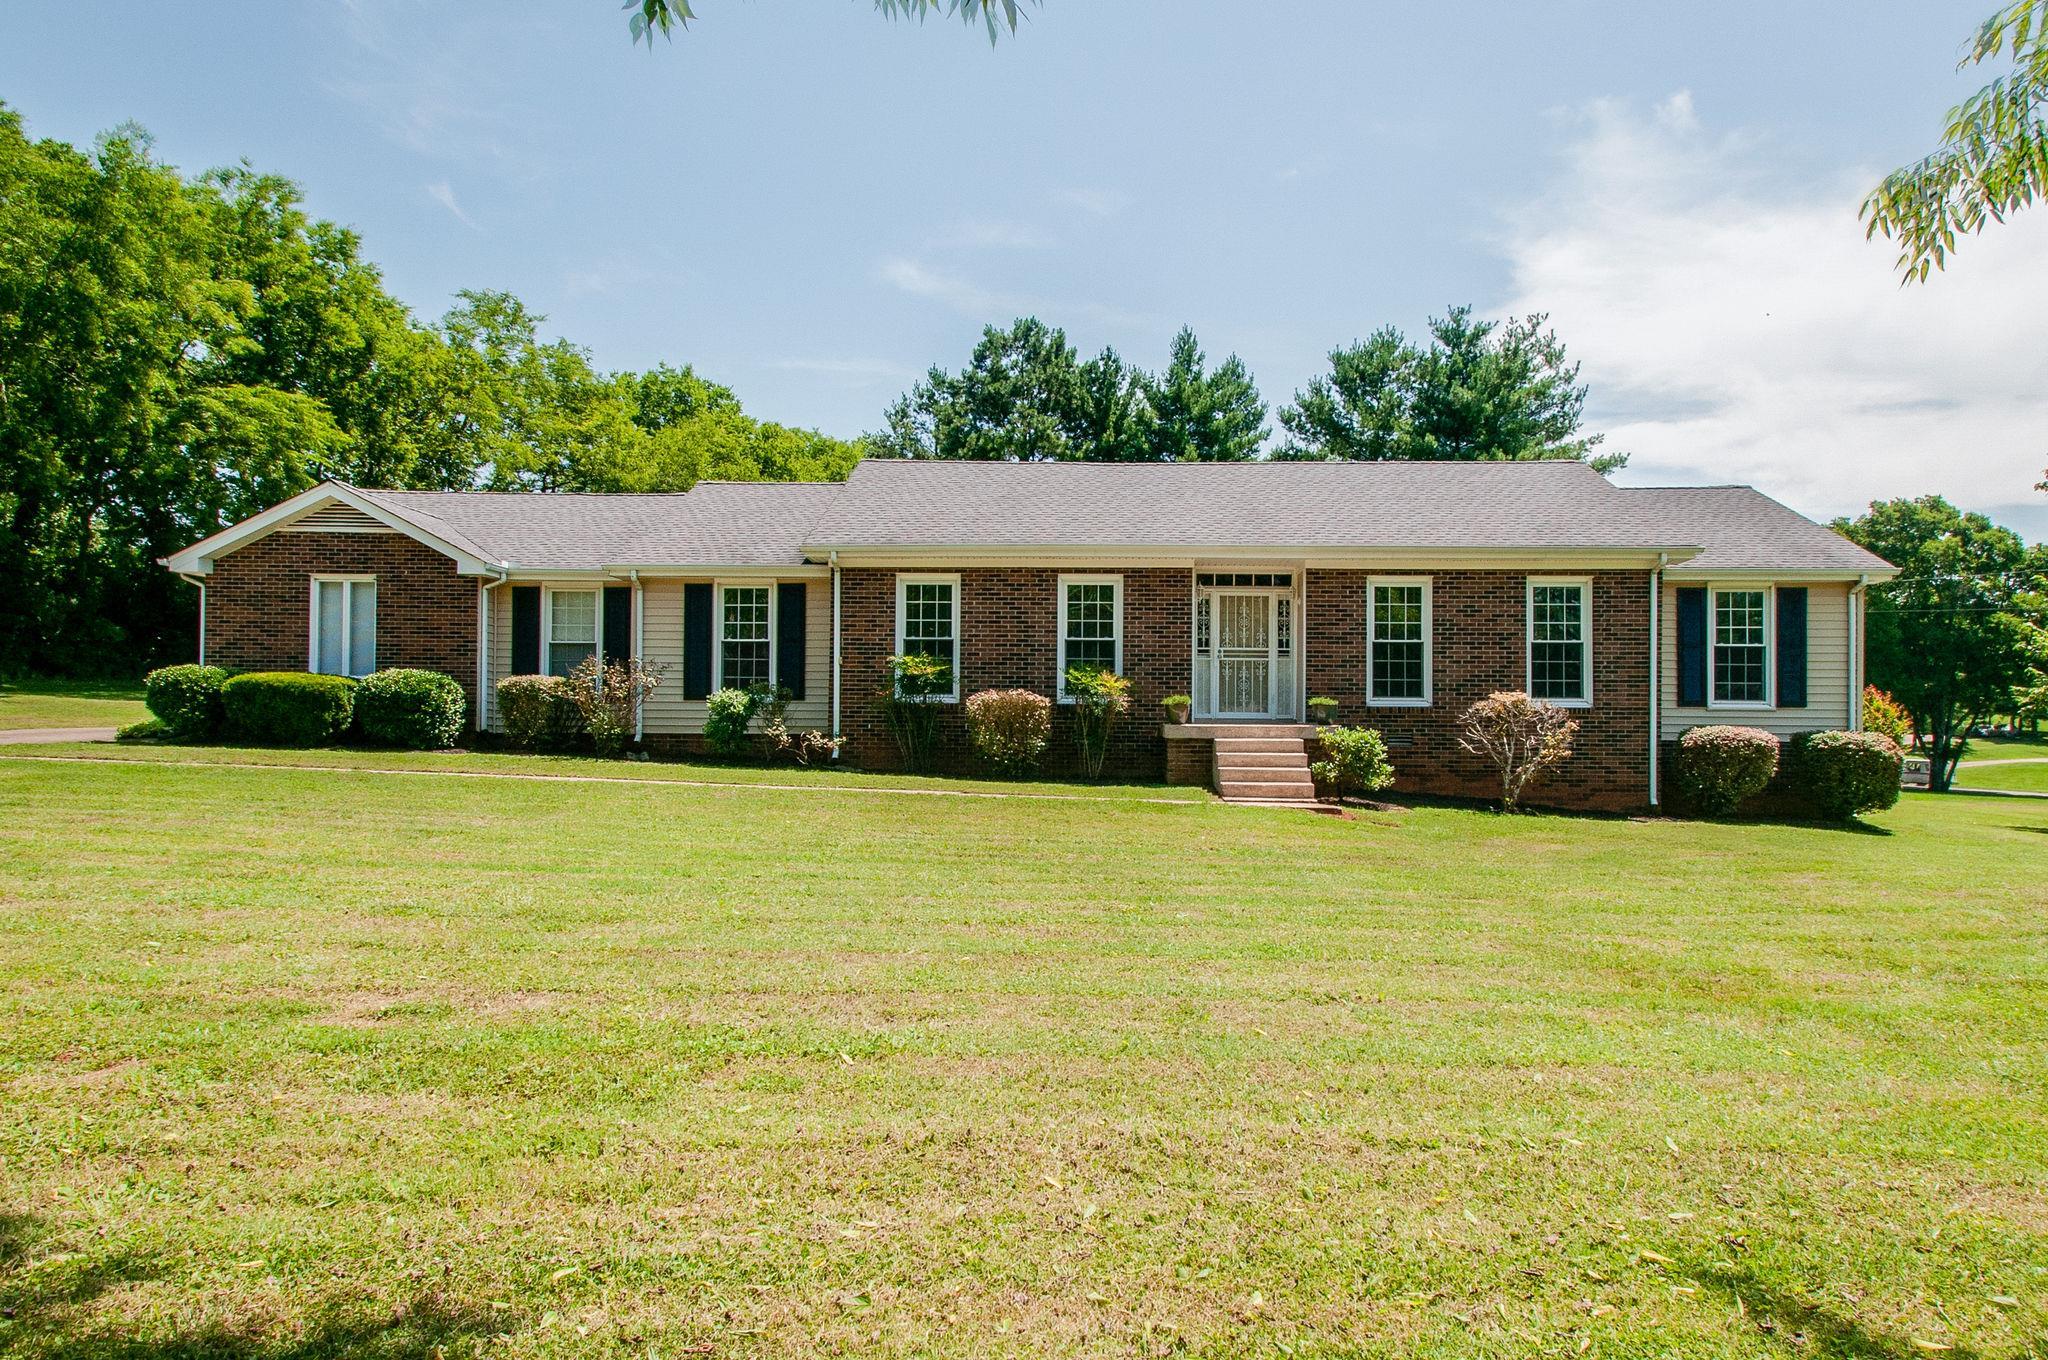 4323 Grandville Blvd, Nashville, TN 37207 - Nashville, TN real estate listing